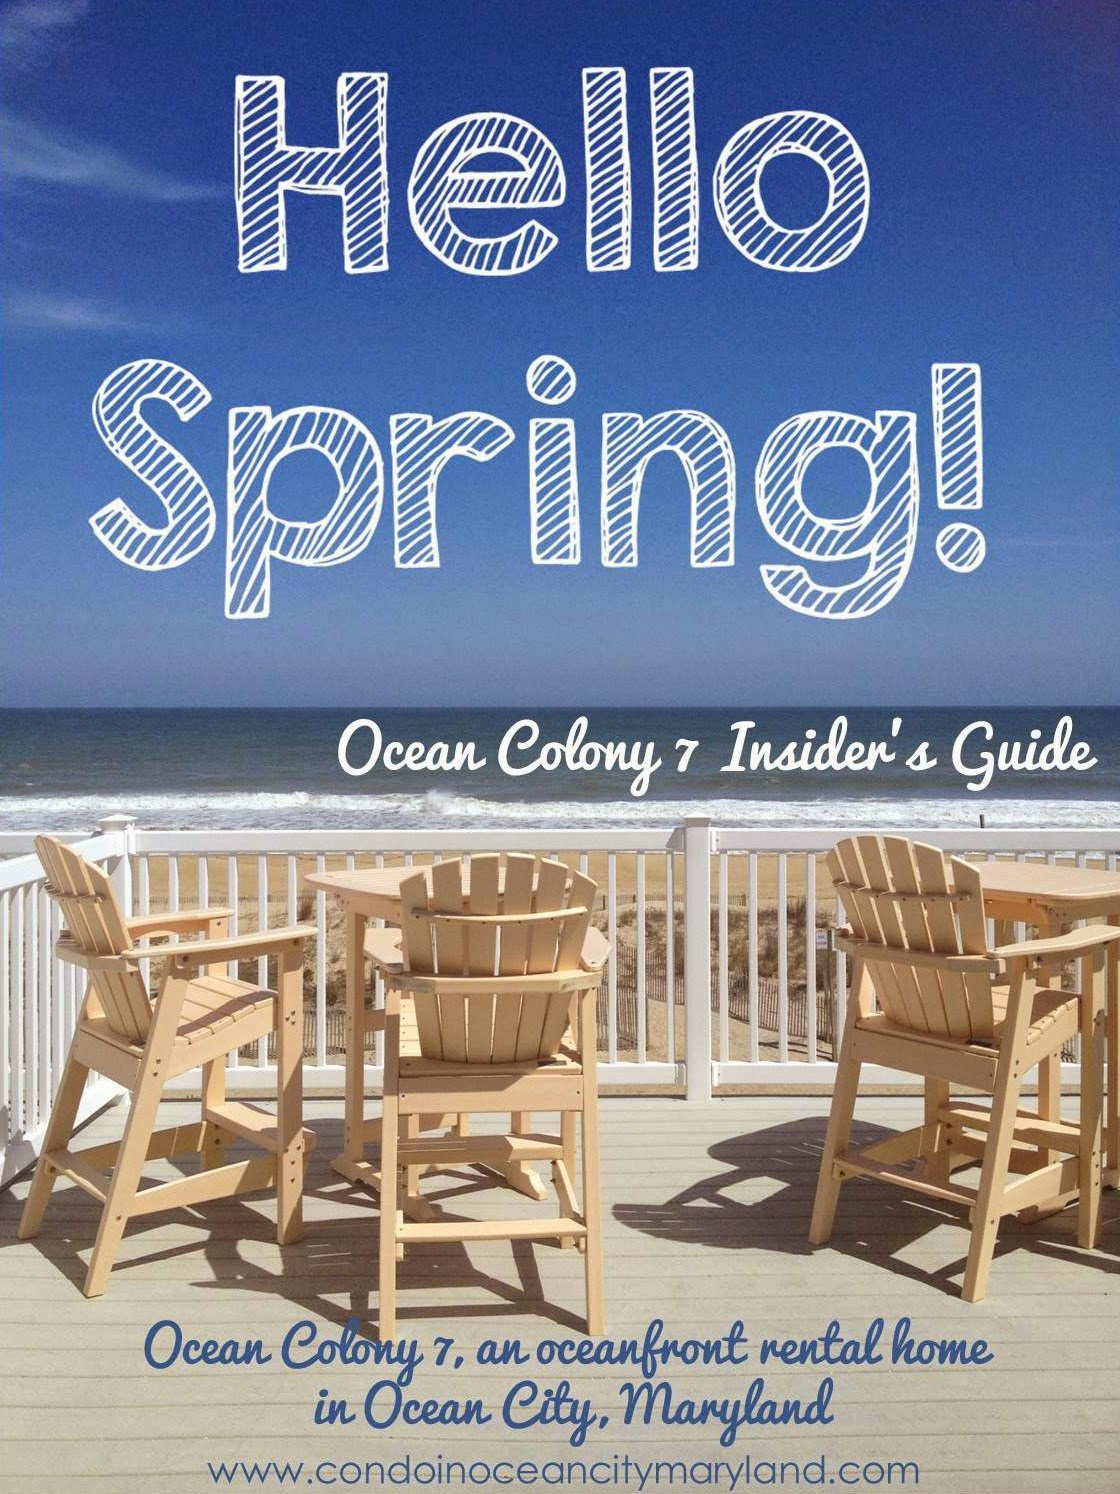 Hello Spring!  Ocean Colony 7 Spring Insider's Guide